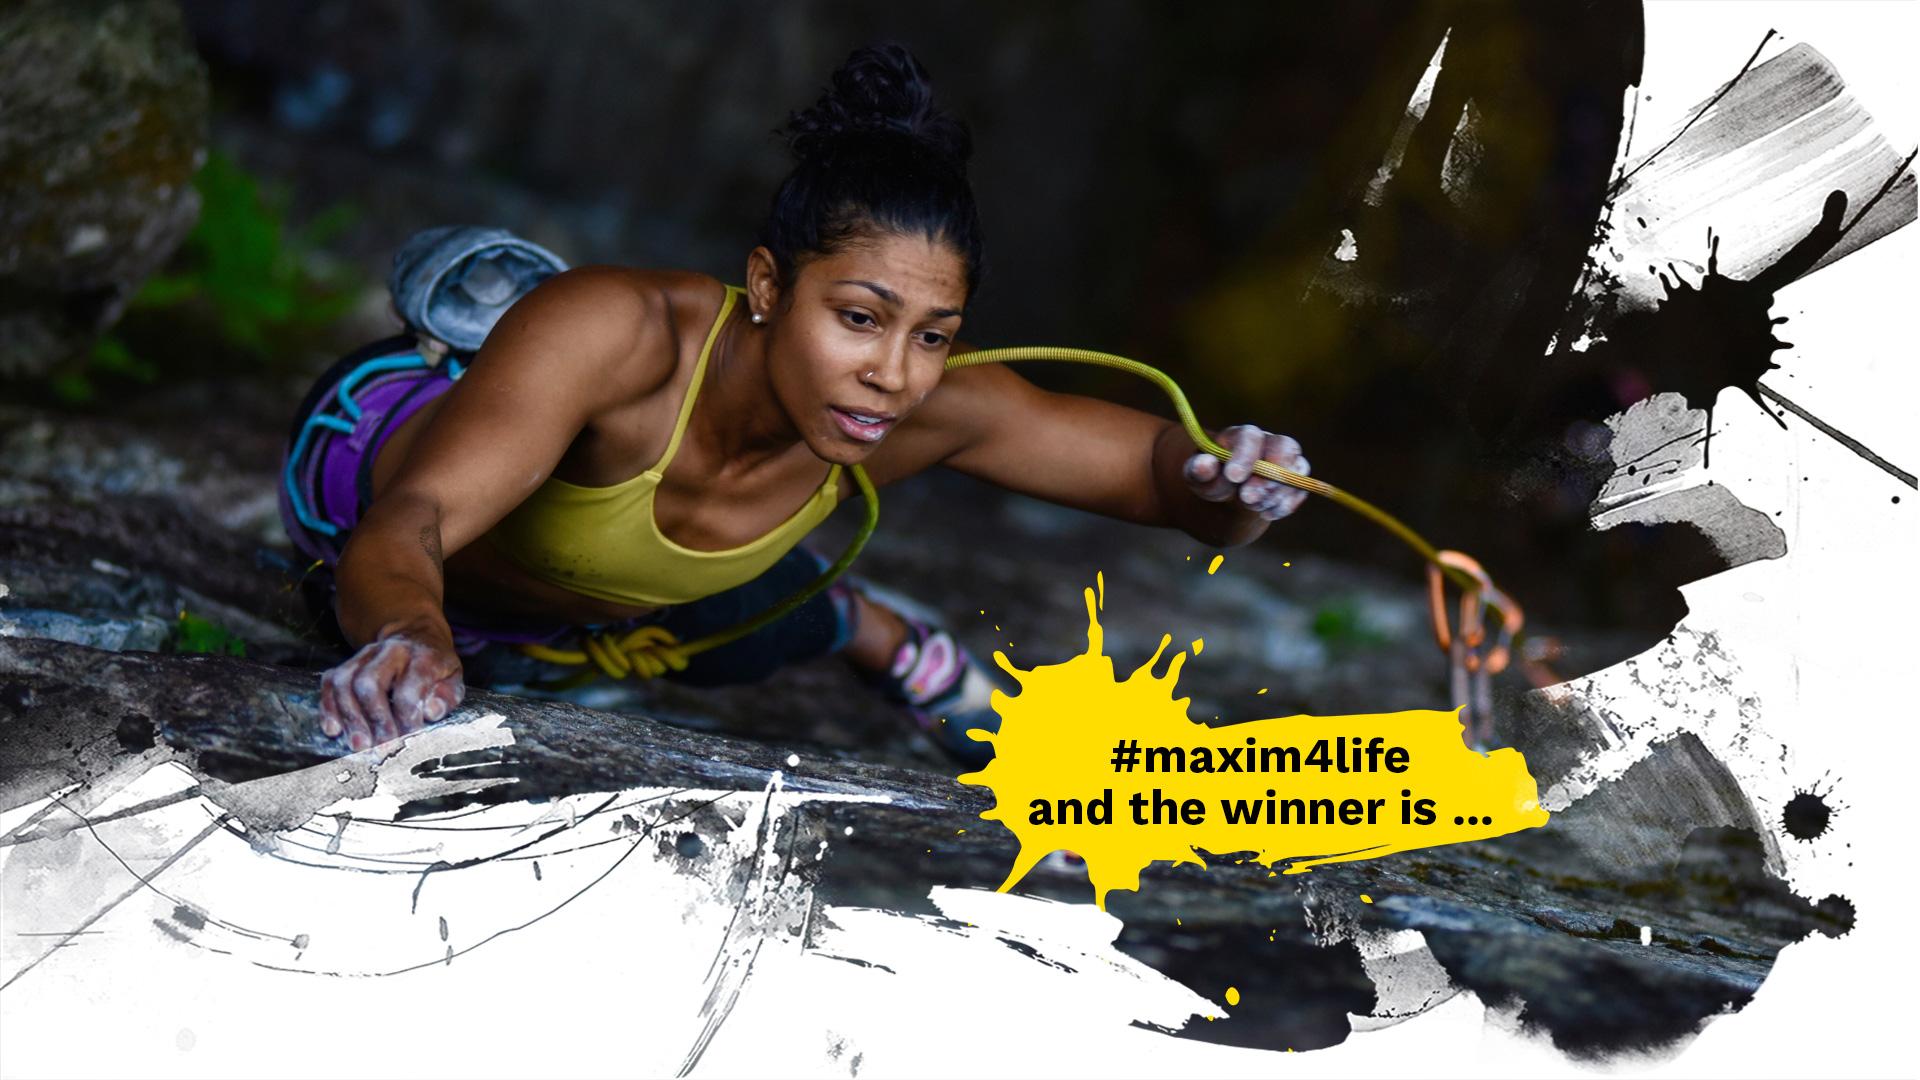 maxim4life Winner